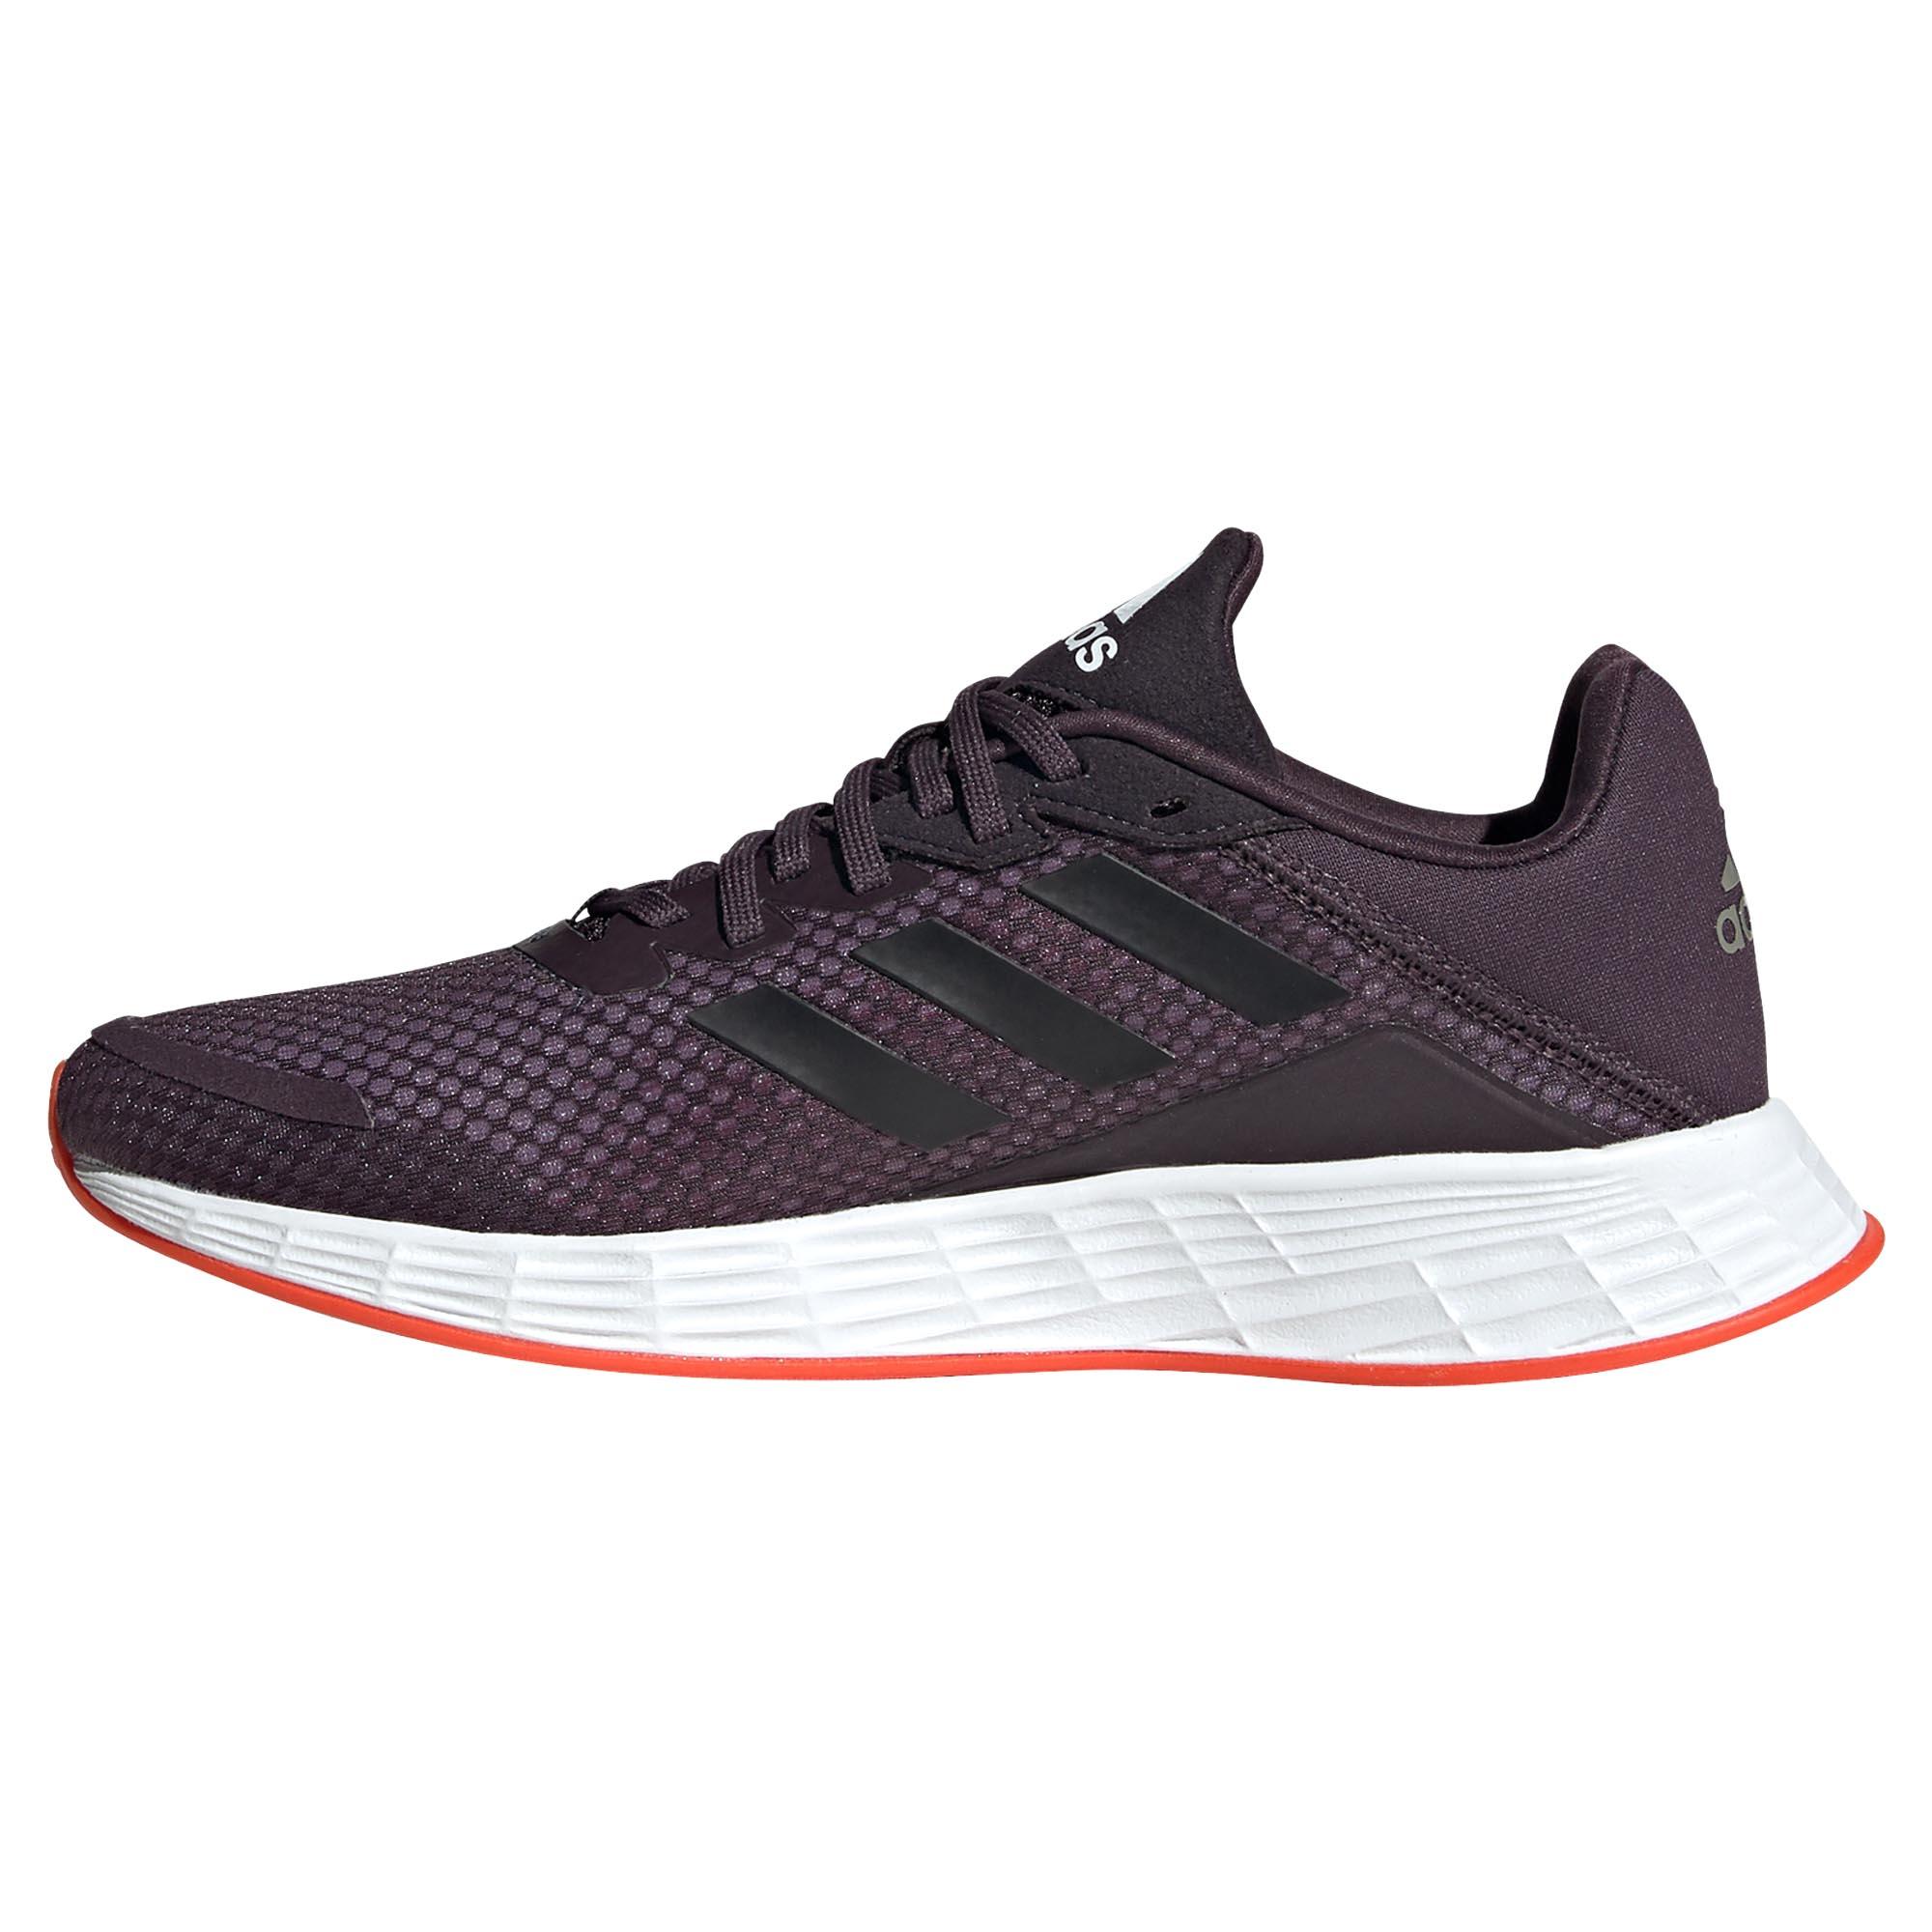 miniature 8 - Adidas Duramo SL Femme Running Fitness Sneaker Chaussure Violet/Noir/Blanc